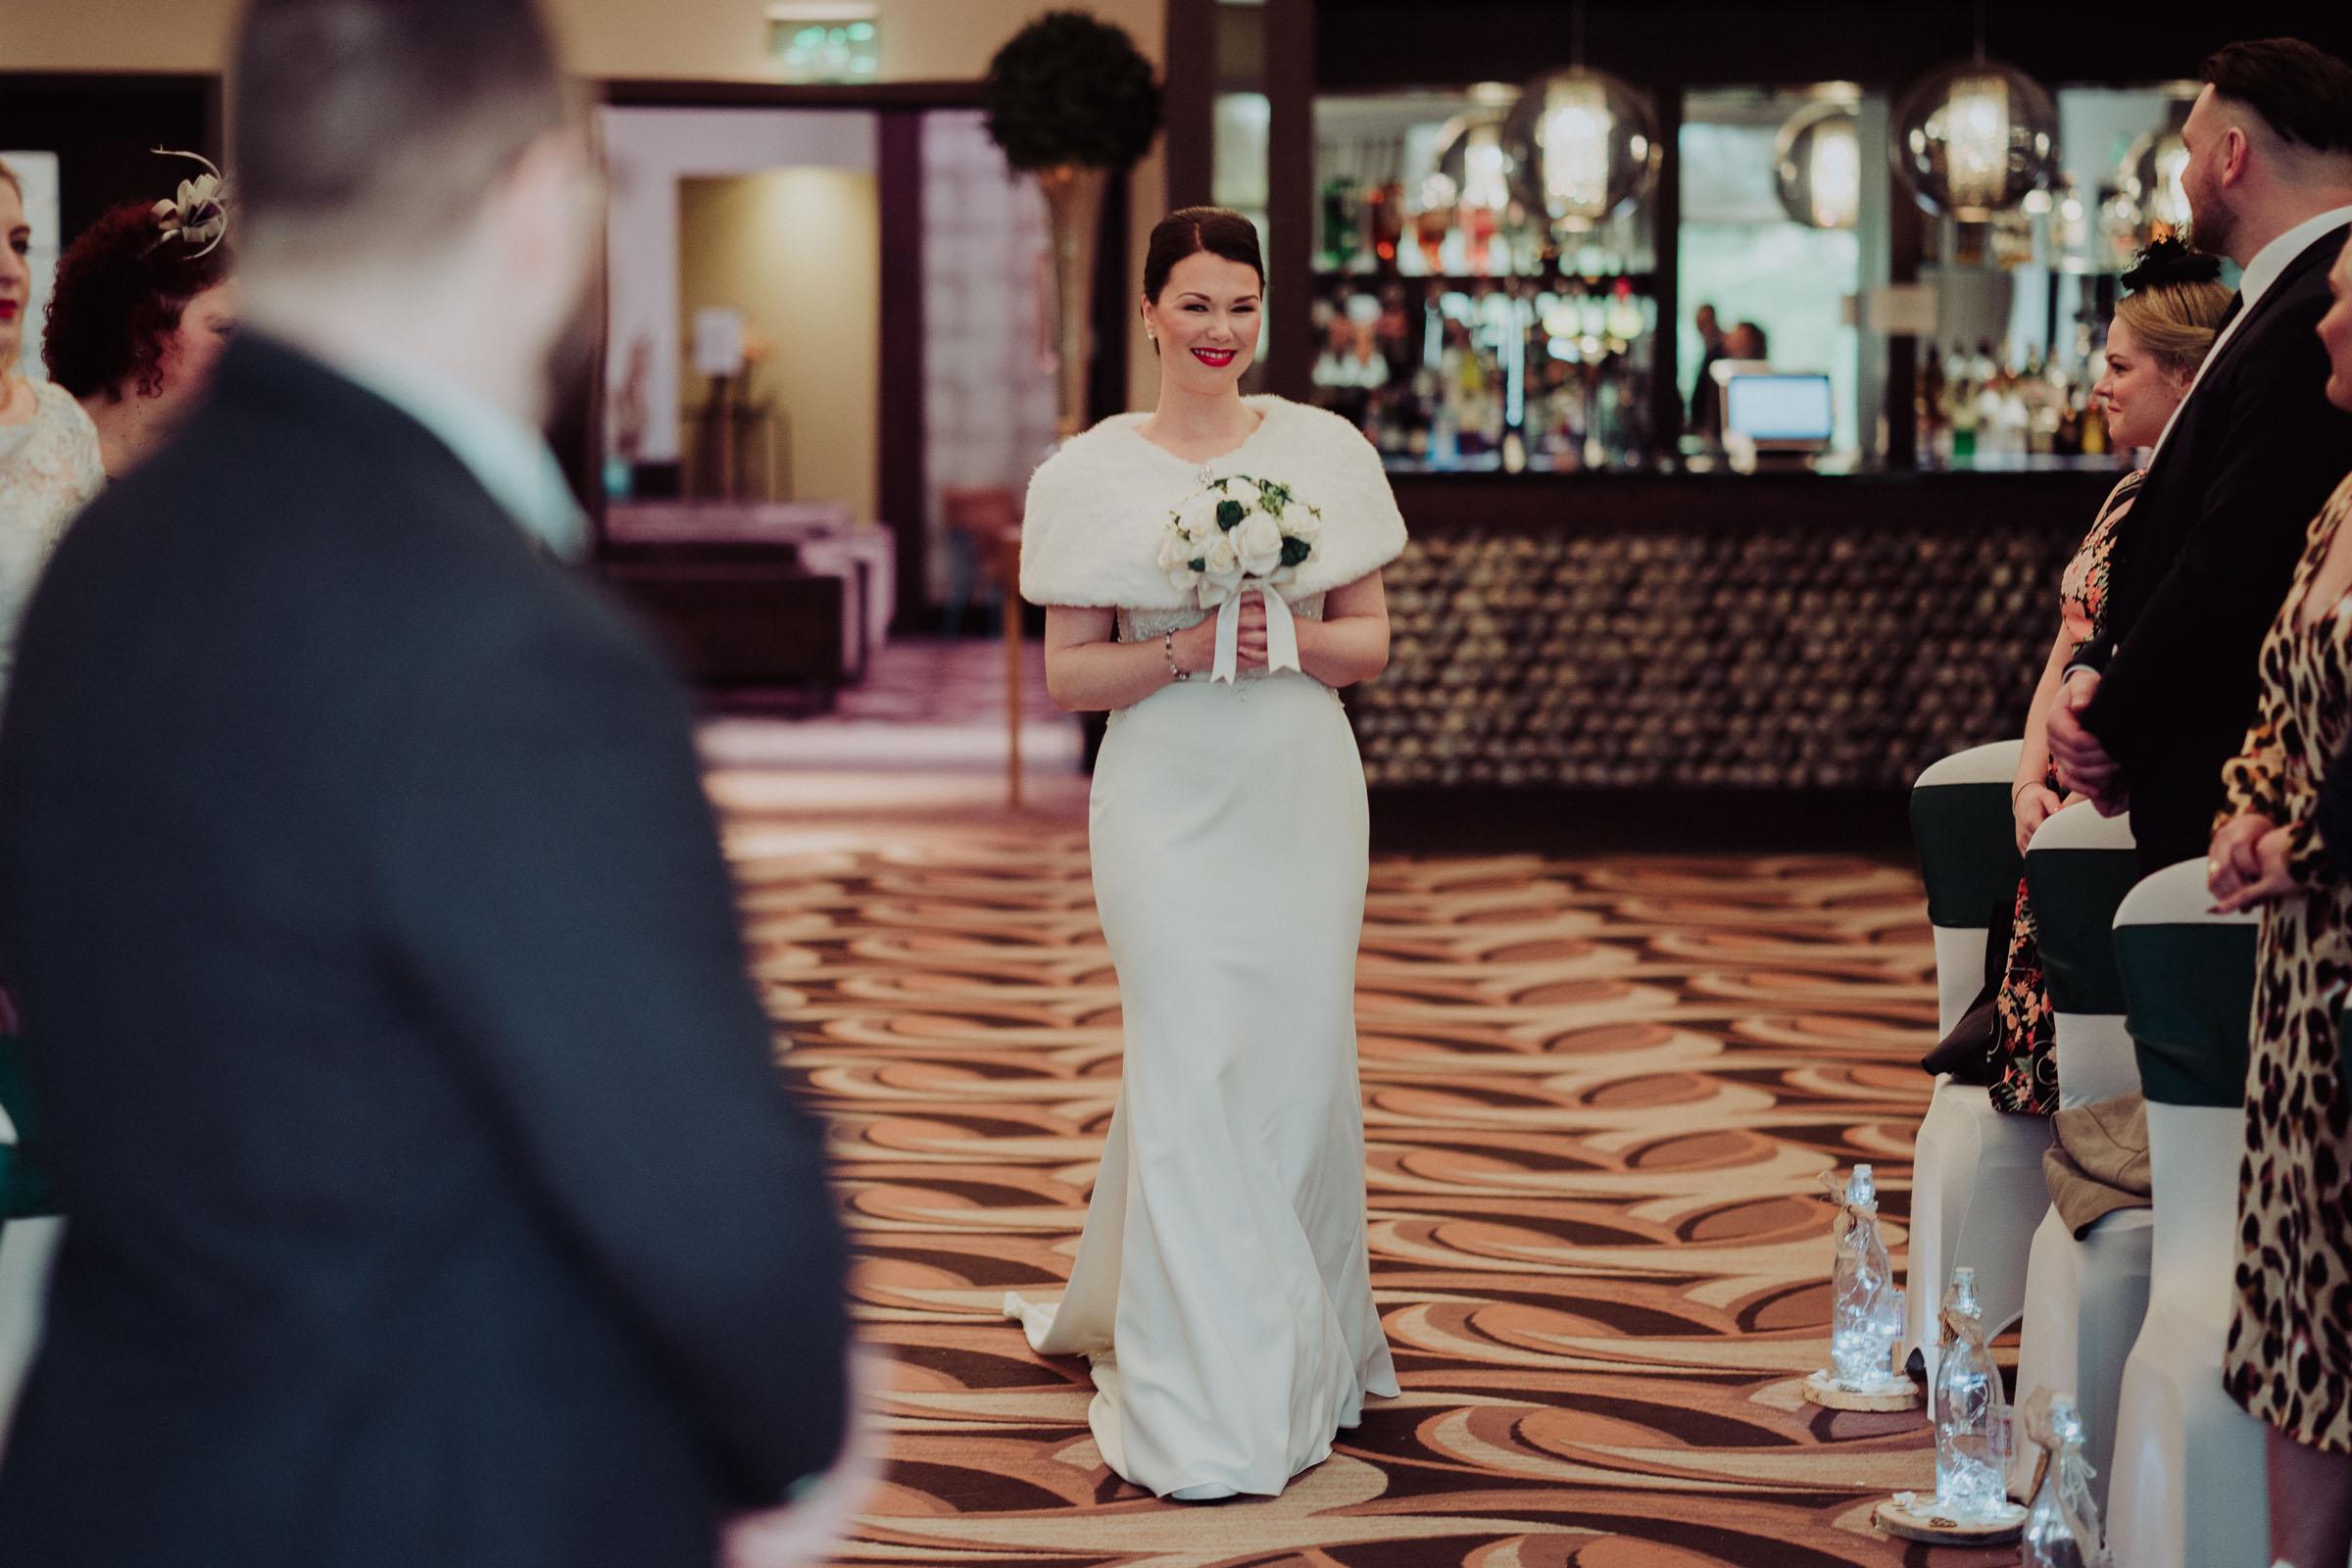 Radstone-Wedding-Dearly-Photography-Scotland (10 of 50).jpg